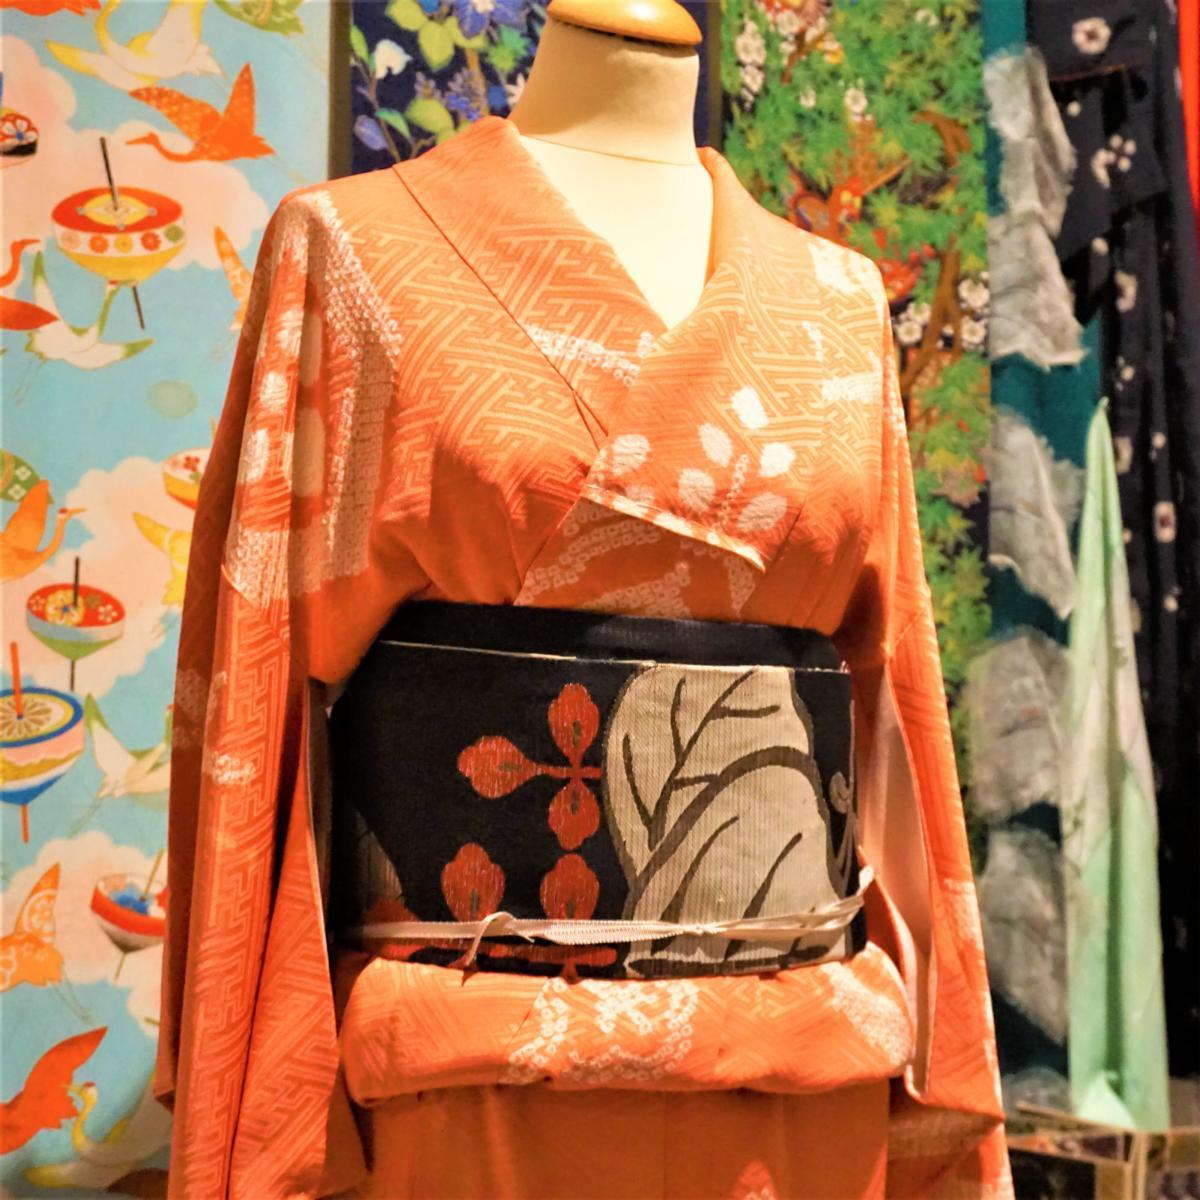 Style Hannover Museum für textile Kunst 2 - Museum für Textile Kunst: Tipp für echte Fashionfans